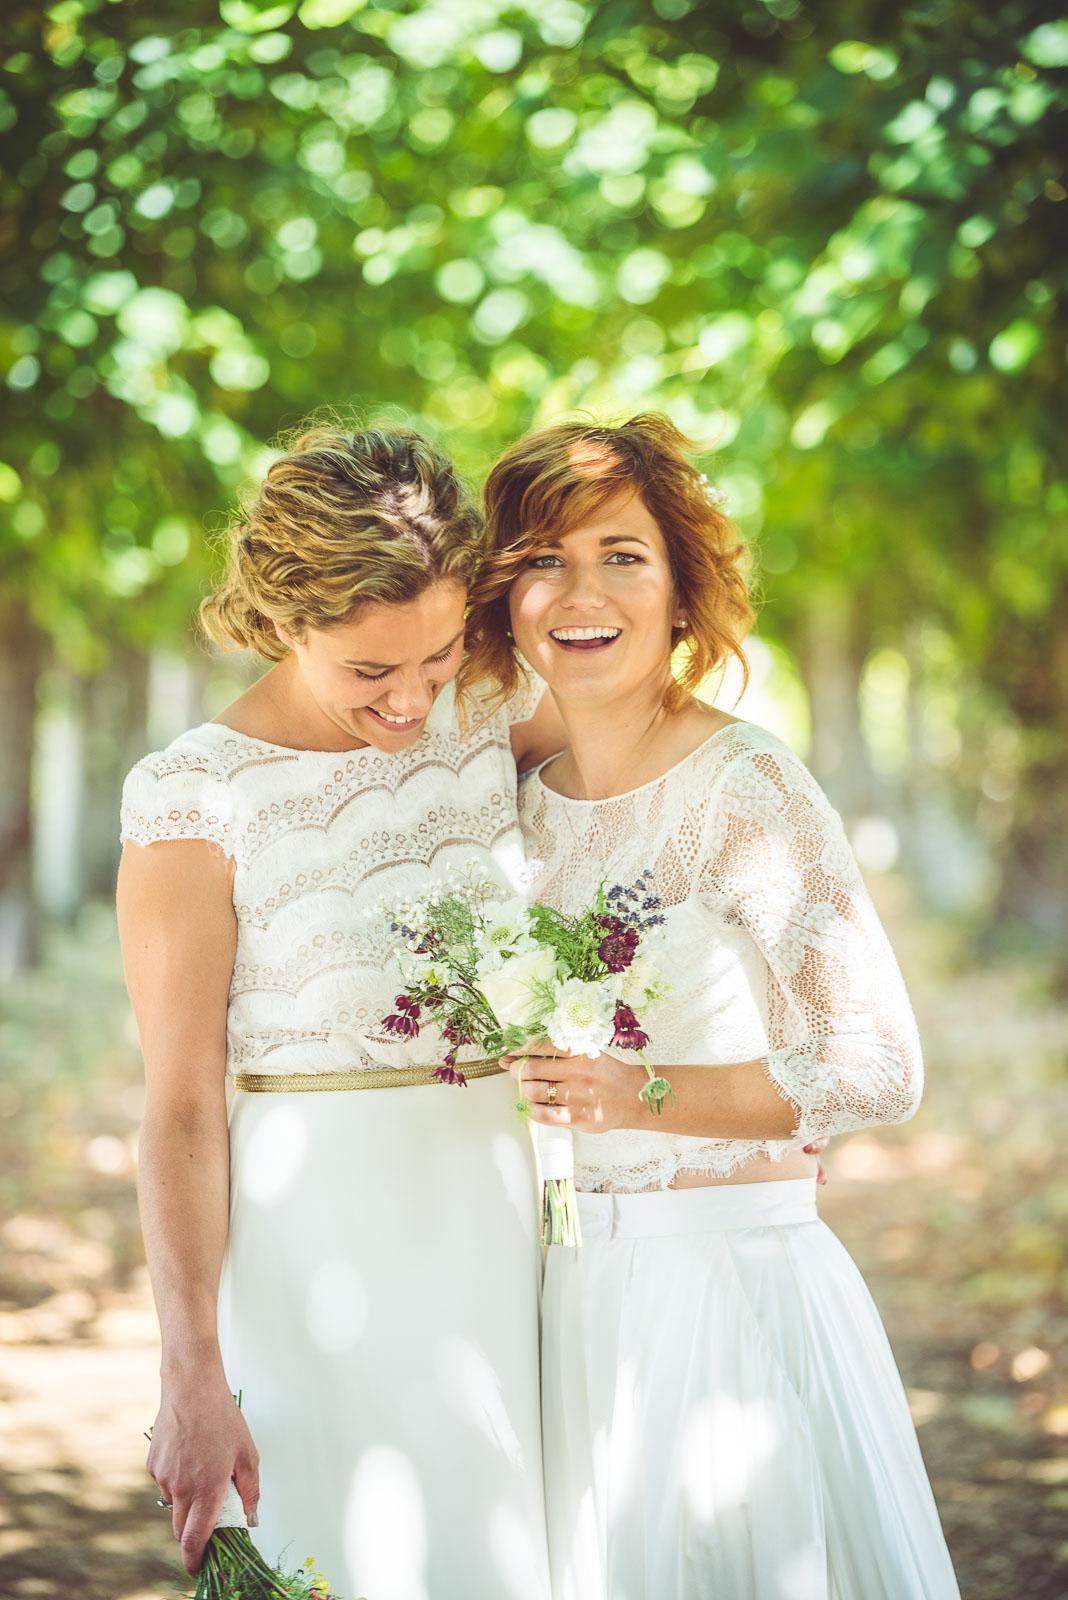 Hitchin_wedding_St_Pauls_Waldenbury_Royston_Wedding_Photographer-27.jpg